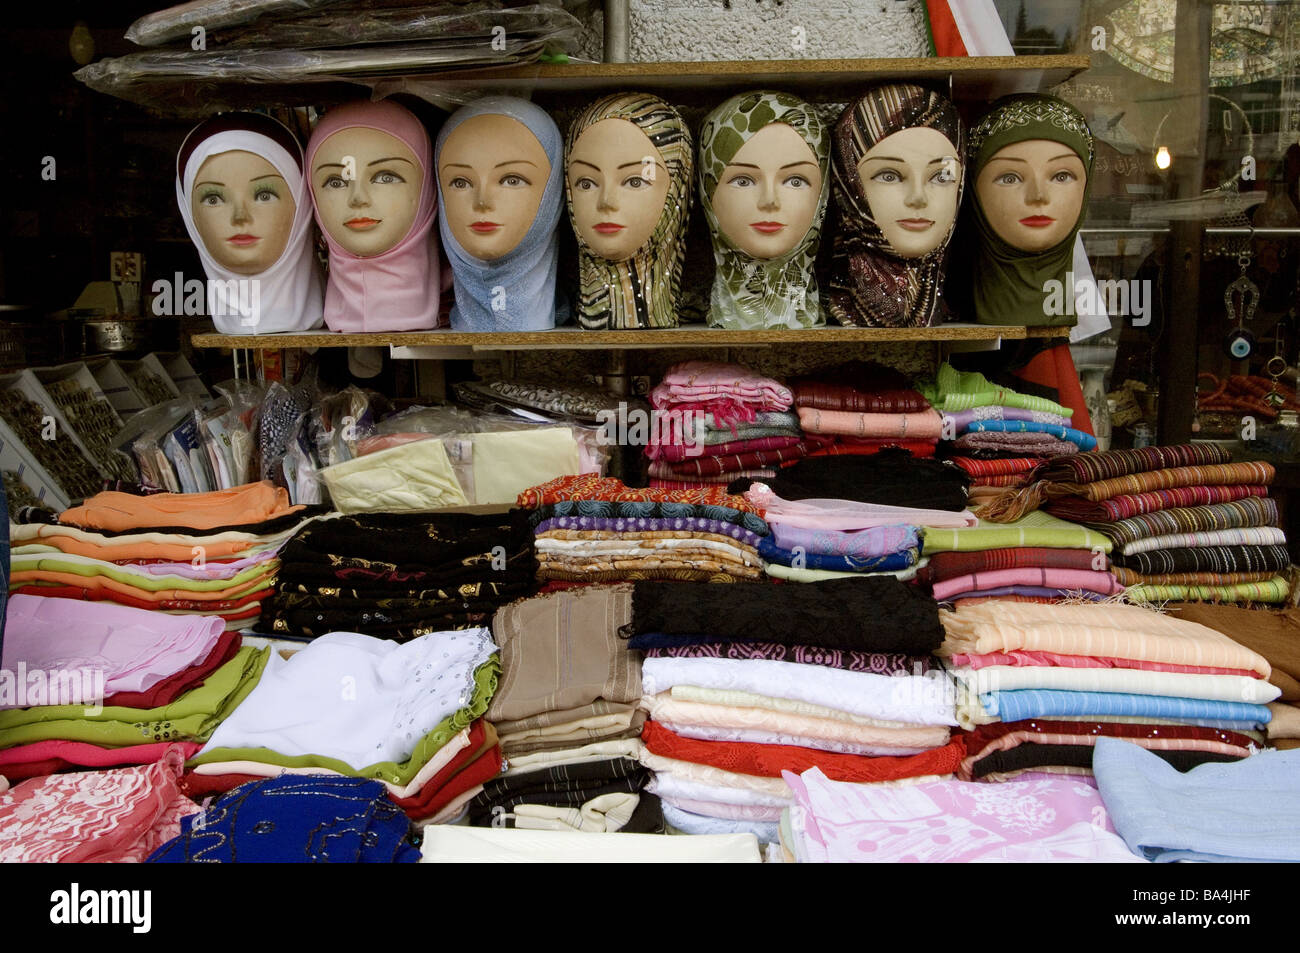 e7c17961d4cc Jordan Amman clothing-business sale kerchiefs Near east city capital  business trade ware clothes-dolls cloths headgears